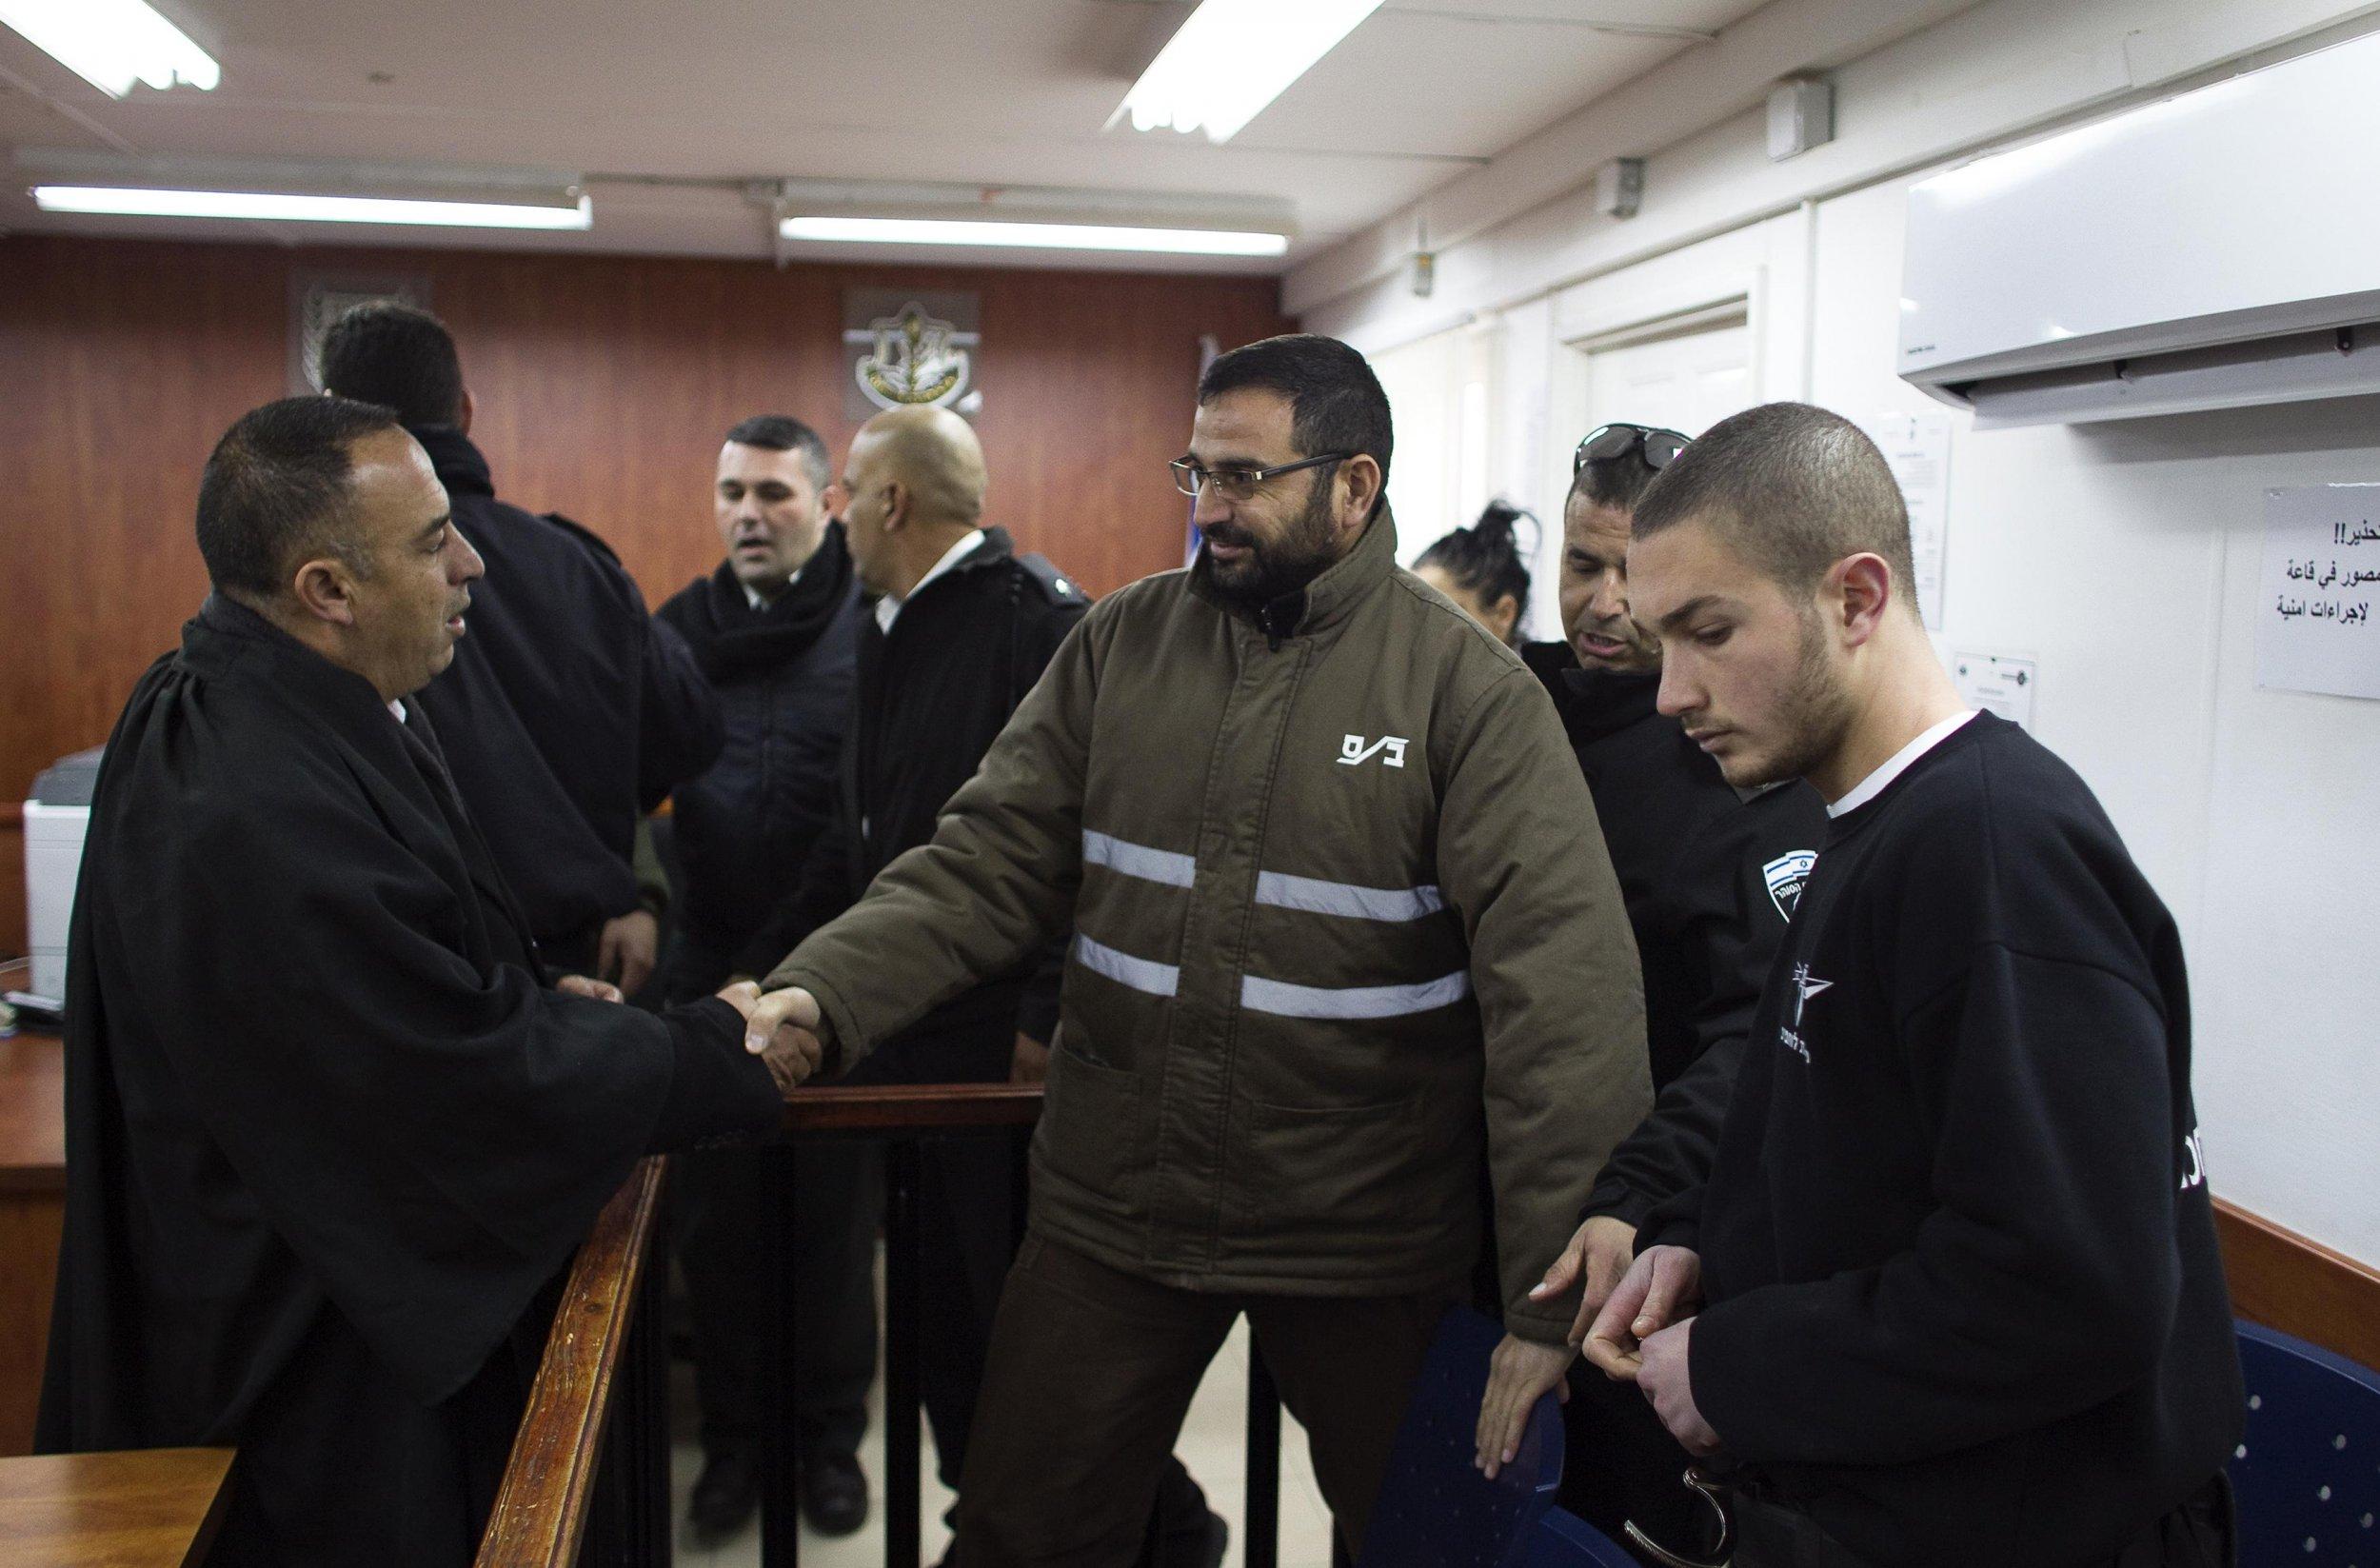 2015-01-06T163515Z_1918218156_GM1EB1701JY01_RTRMADP_3_ISRAEL-PALESTINIANS-COURT